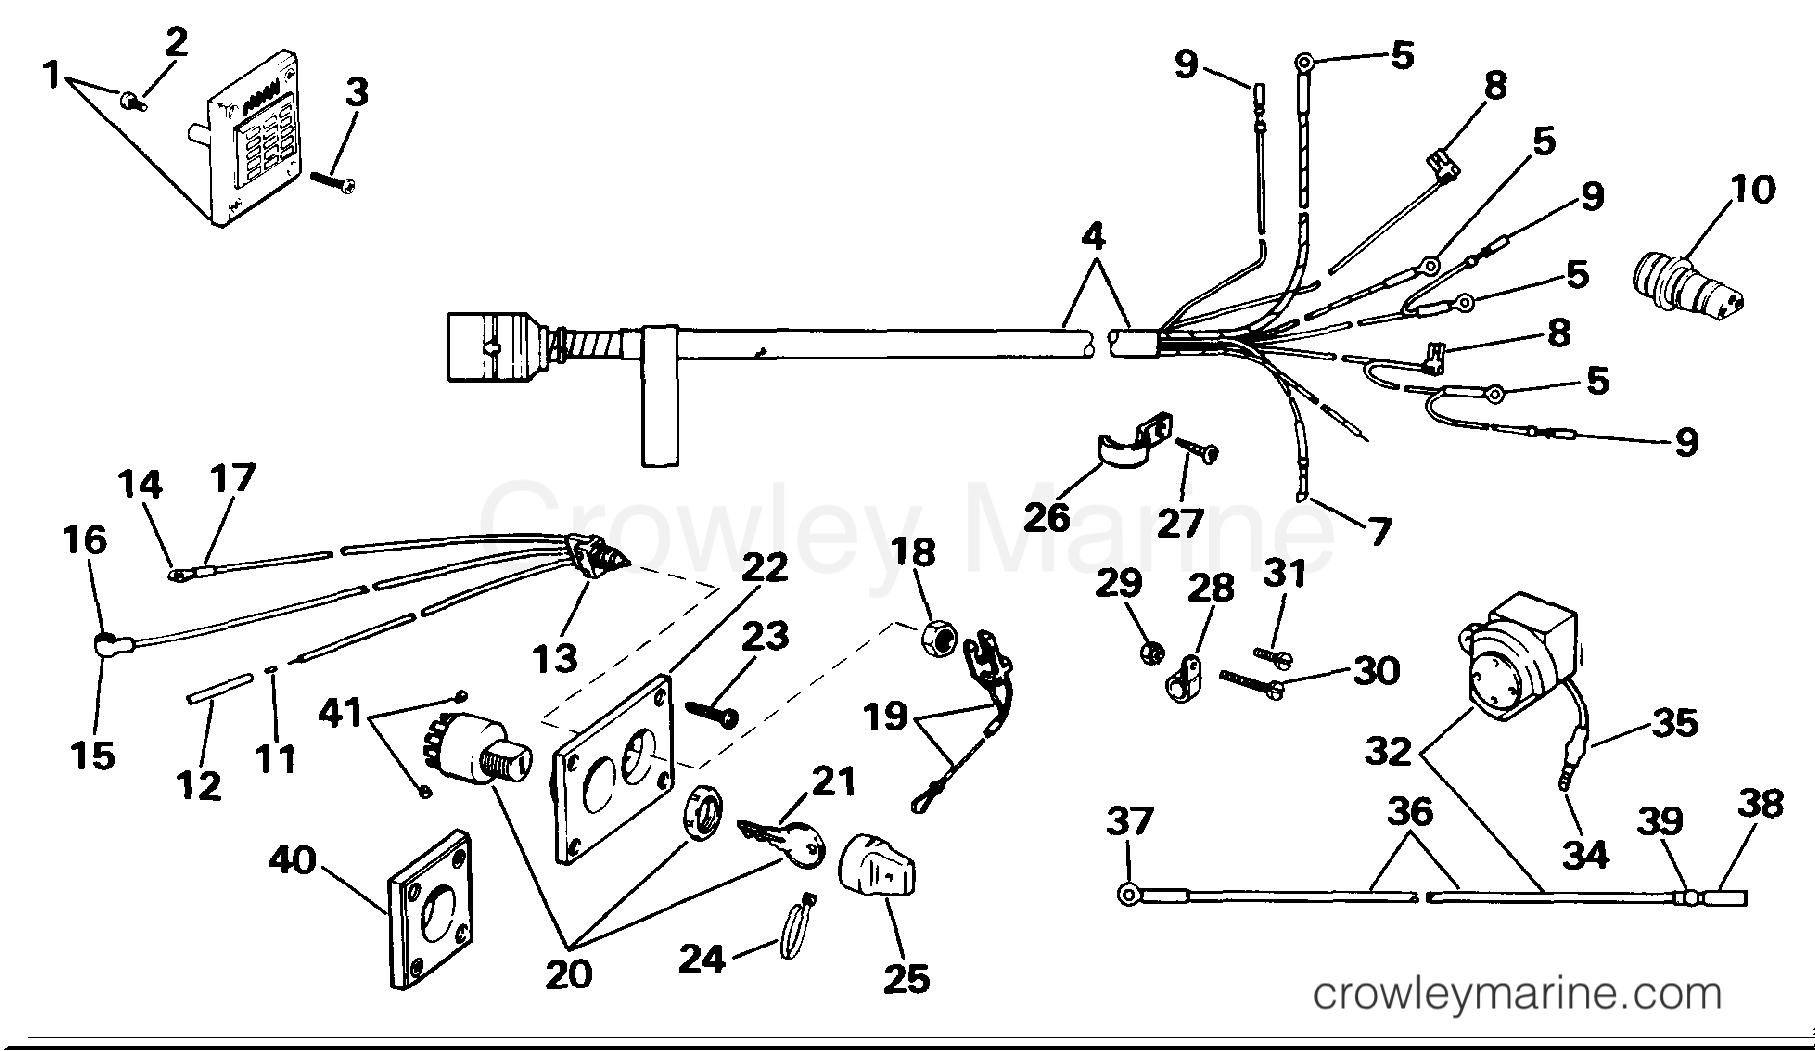 Wiring Kit - Remote Electric Start  10 Thru V8